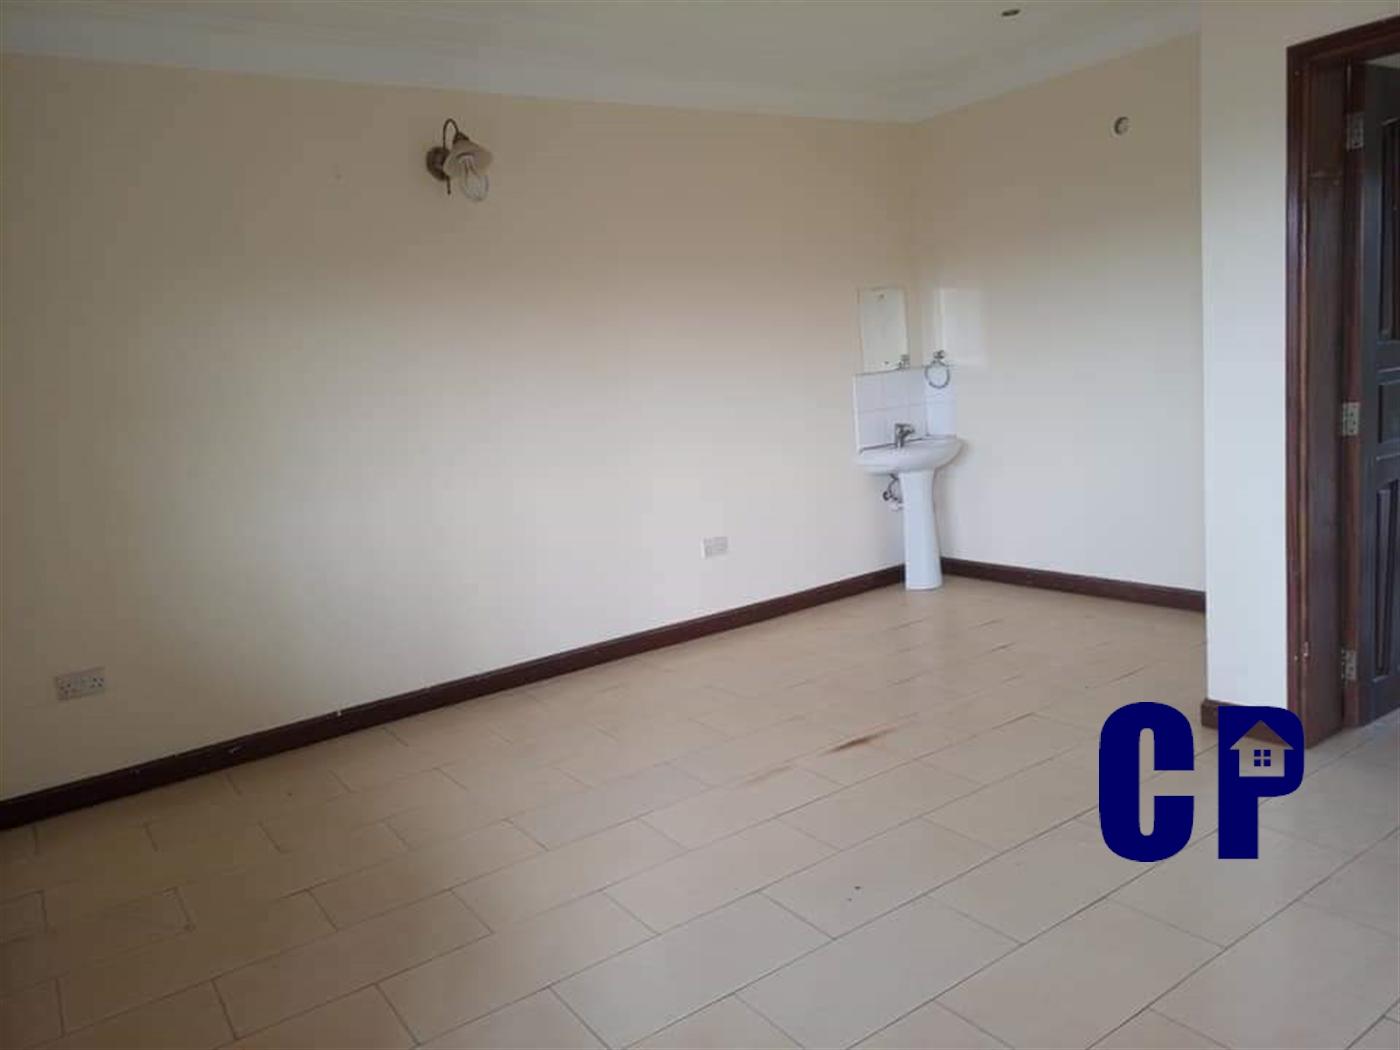 Apartment for rent in Ntindda Kampala